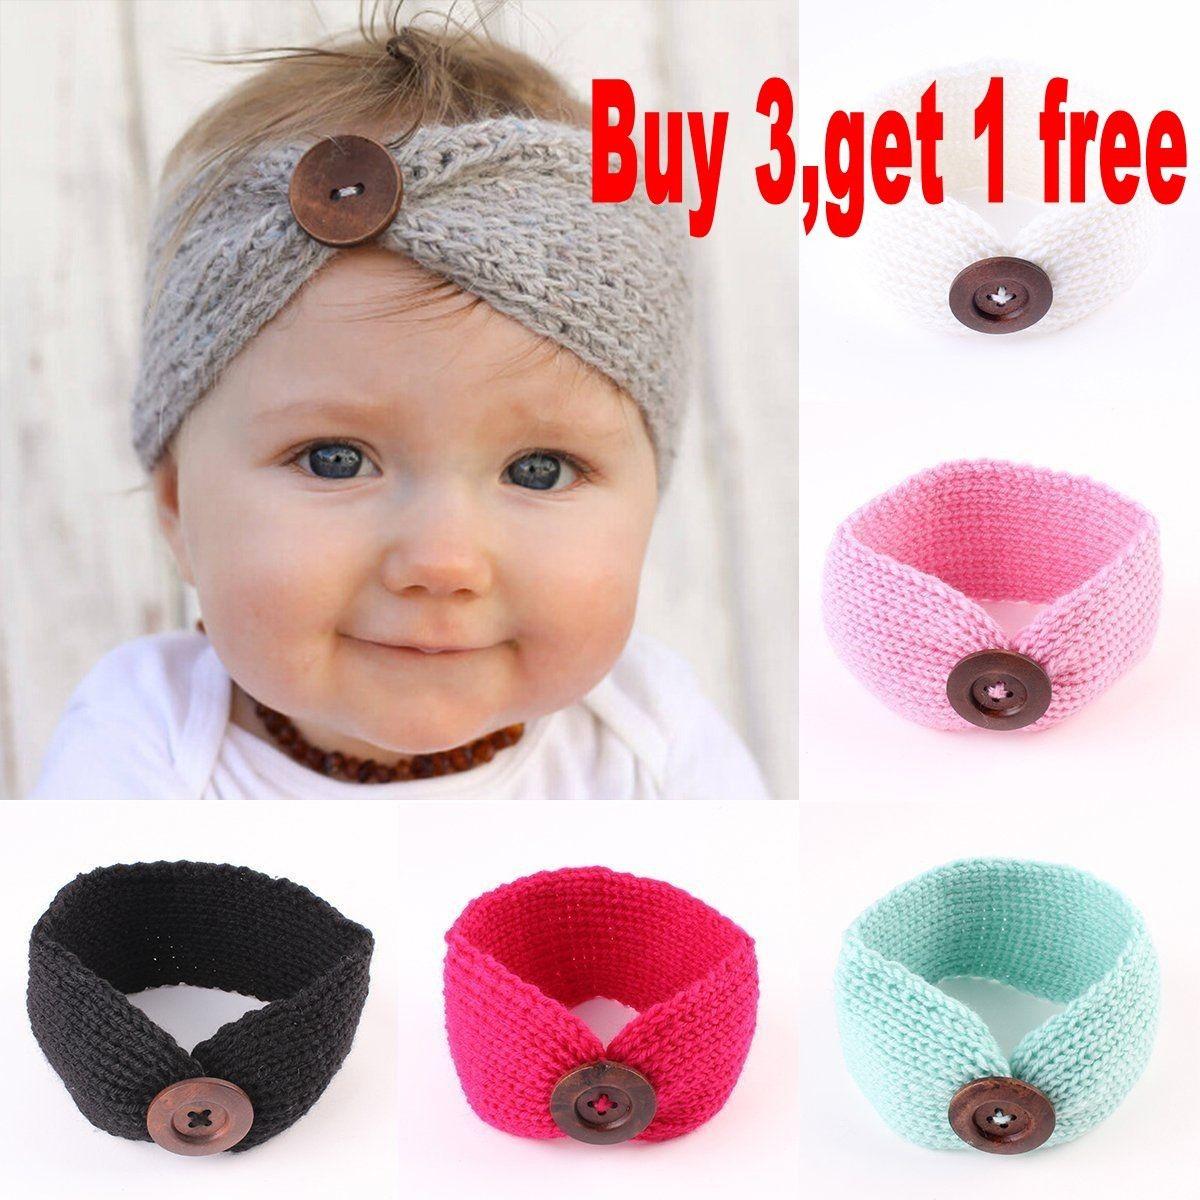 0.99 - Cute Kids Baby Girls Toddler Knit Turban Hair Band Headwear Headband  Accessories  ebay  Fashion 7cdf01d38dd